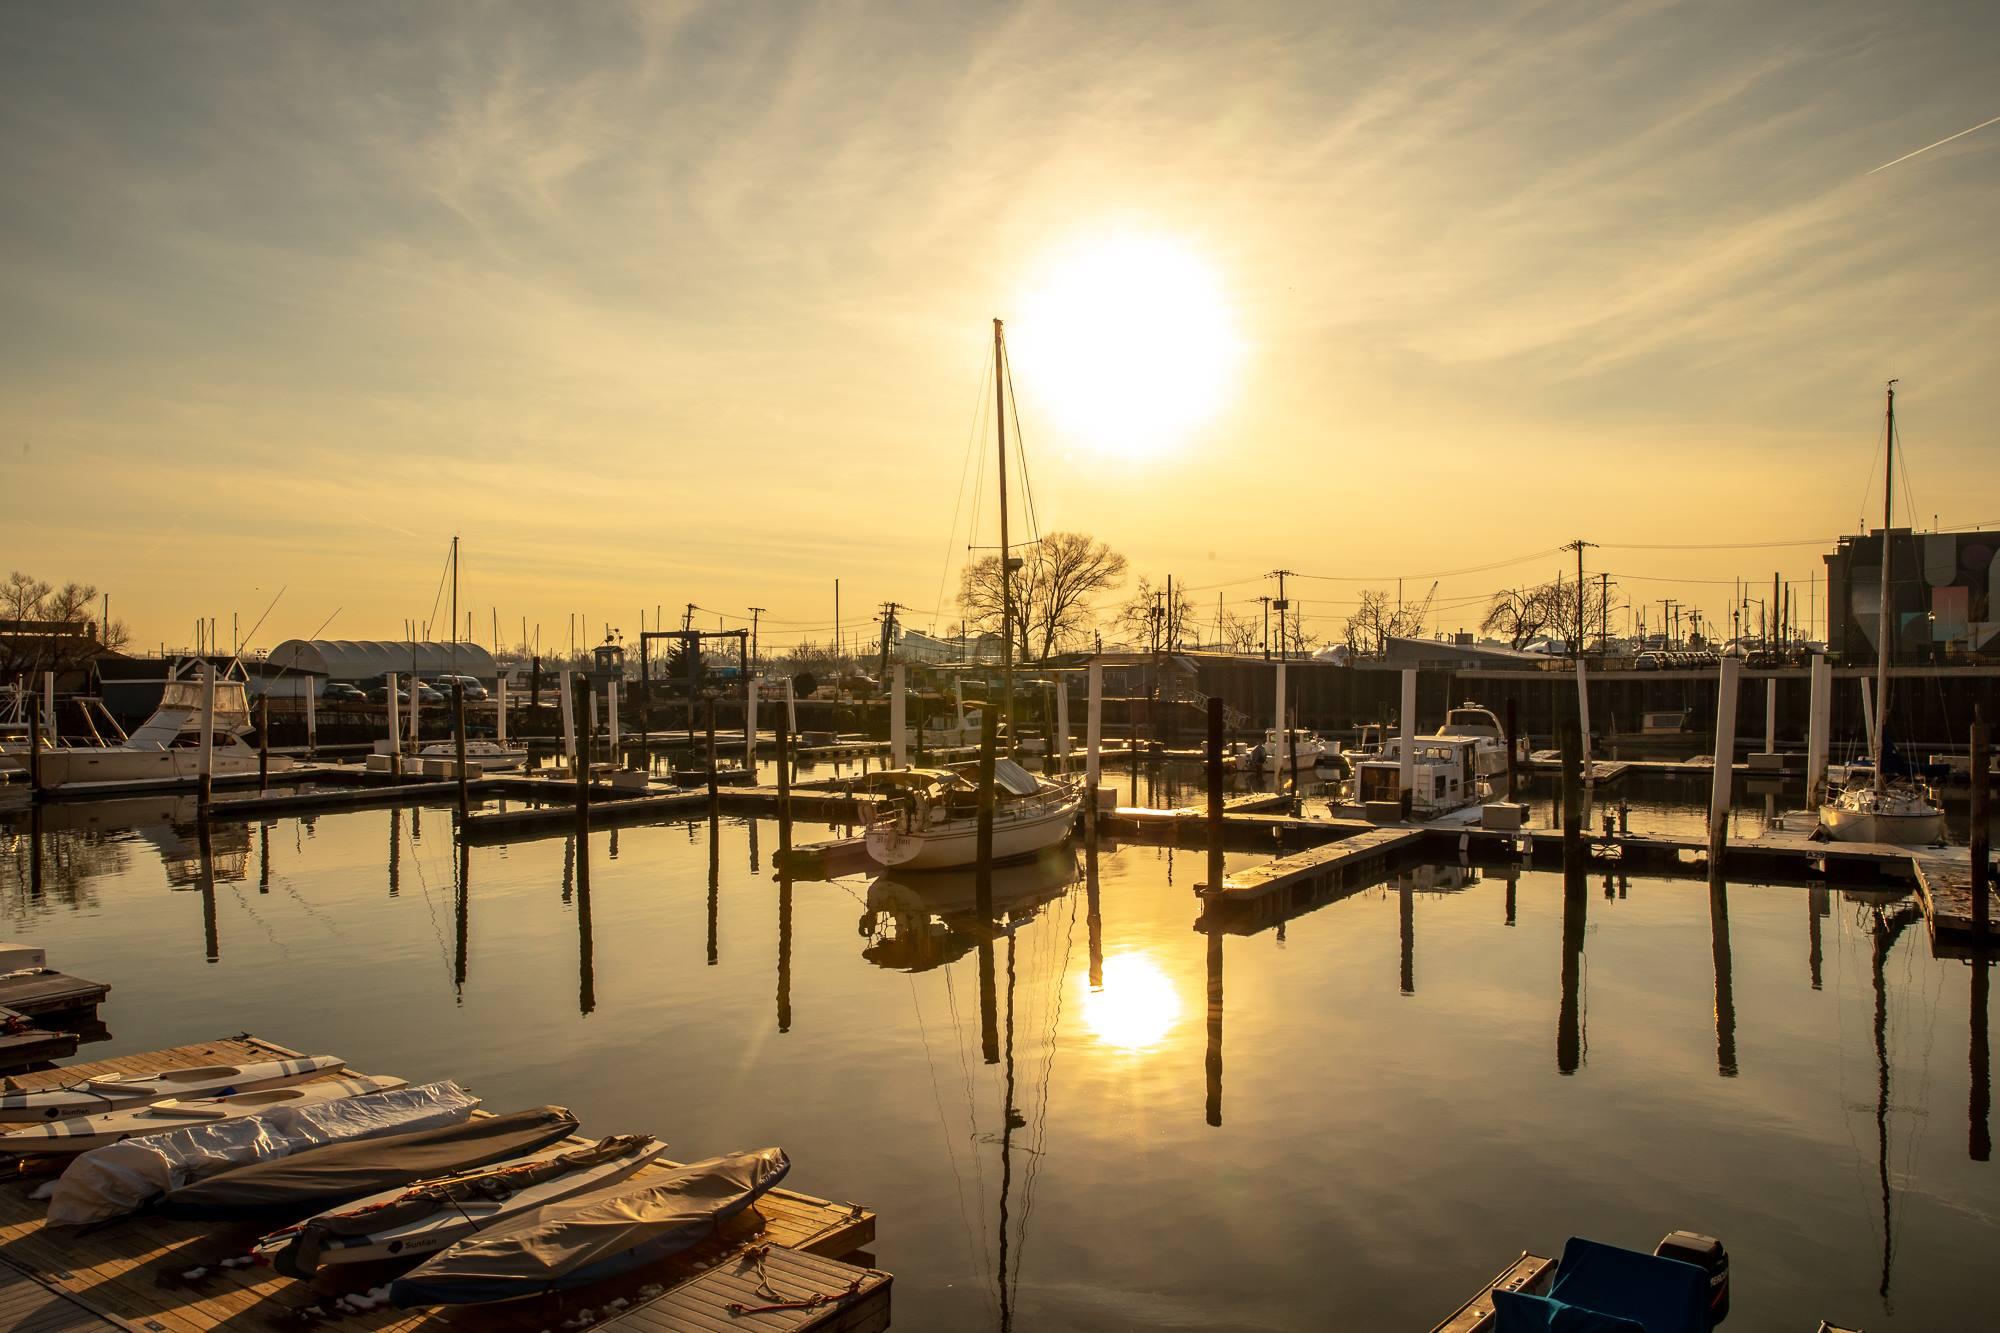 #9 Hudson Point Marina